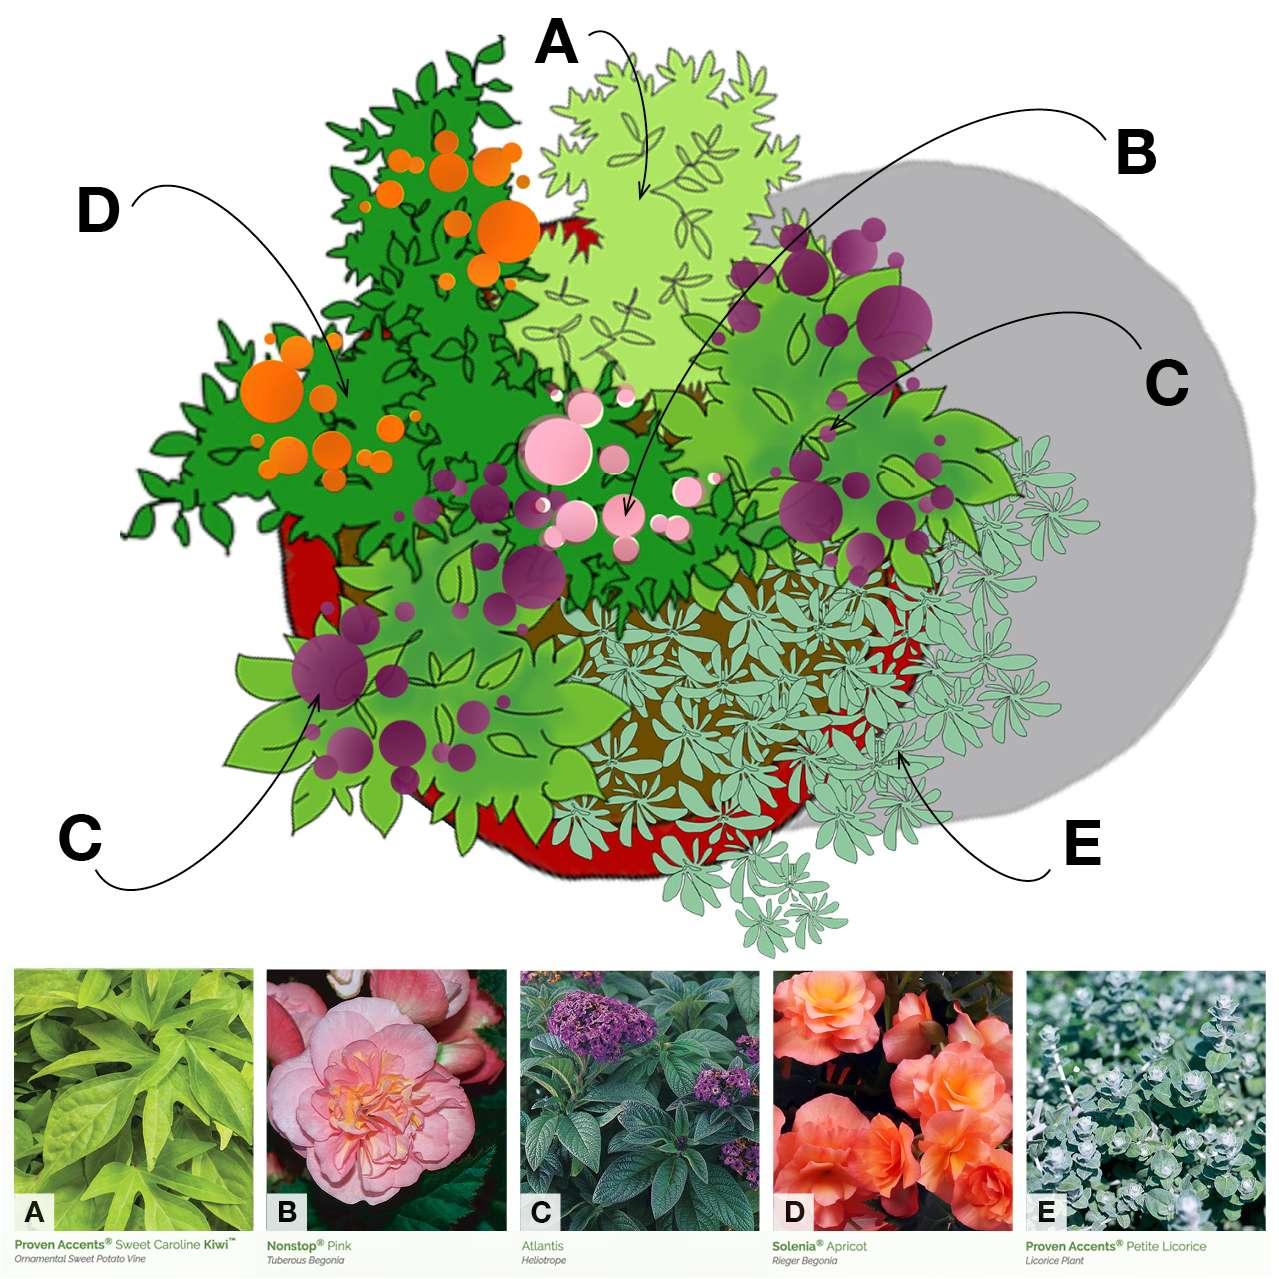 home-outside-planter-combination-part-sun-proven-winners-plants-annuals-plan-view